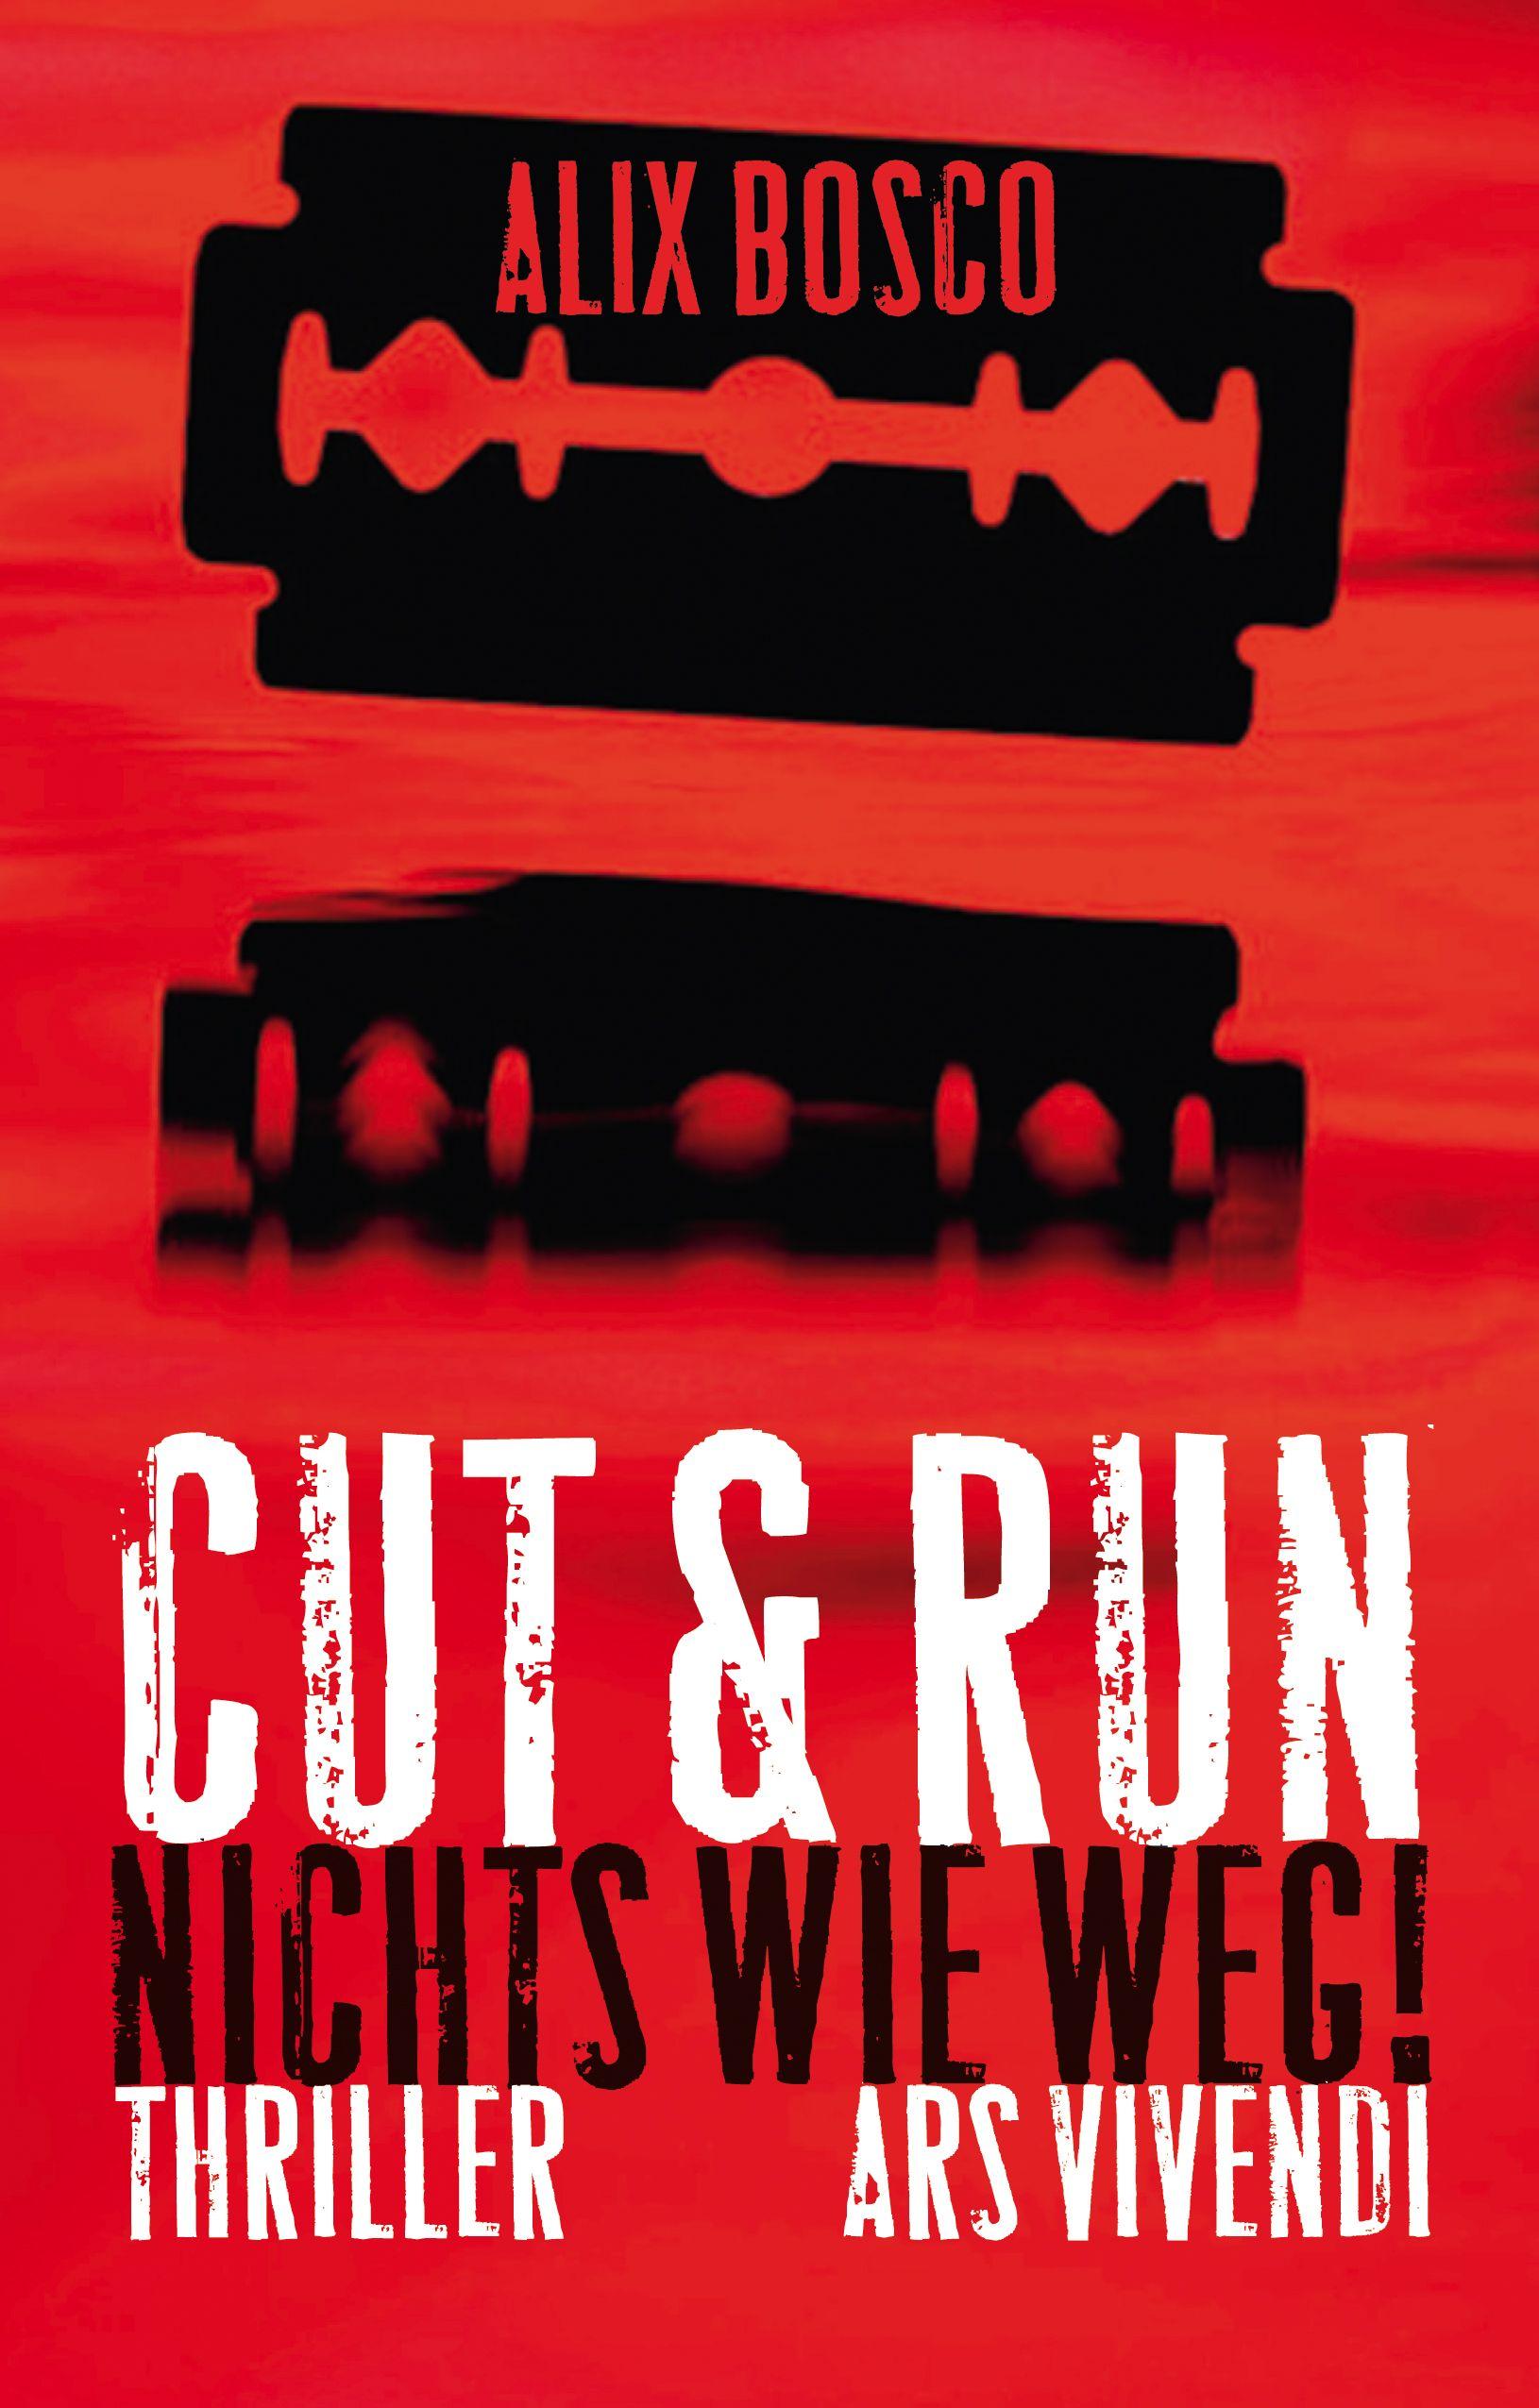 Alix Bosco: Cut & Run – Nichts wie weg!, published by Ars Vivendi.